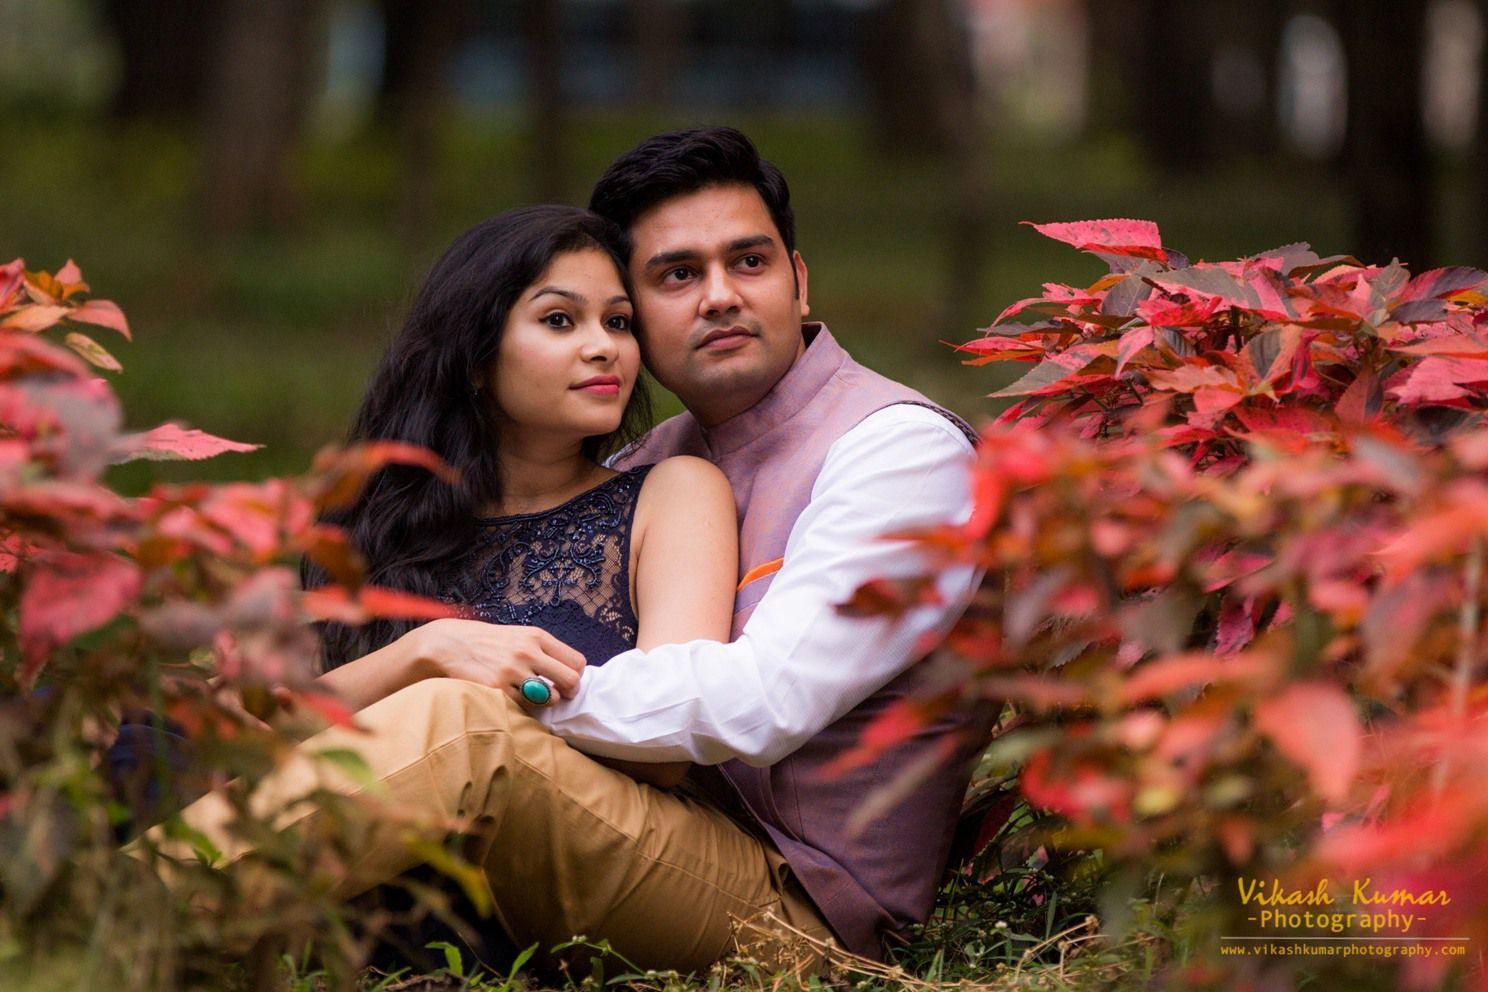 Indian Pre Wedding Photo shoot Ideas 2015 Latest Fashion Trends